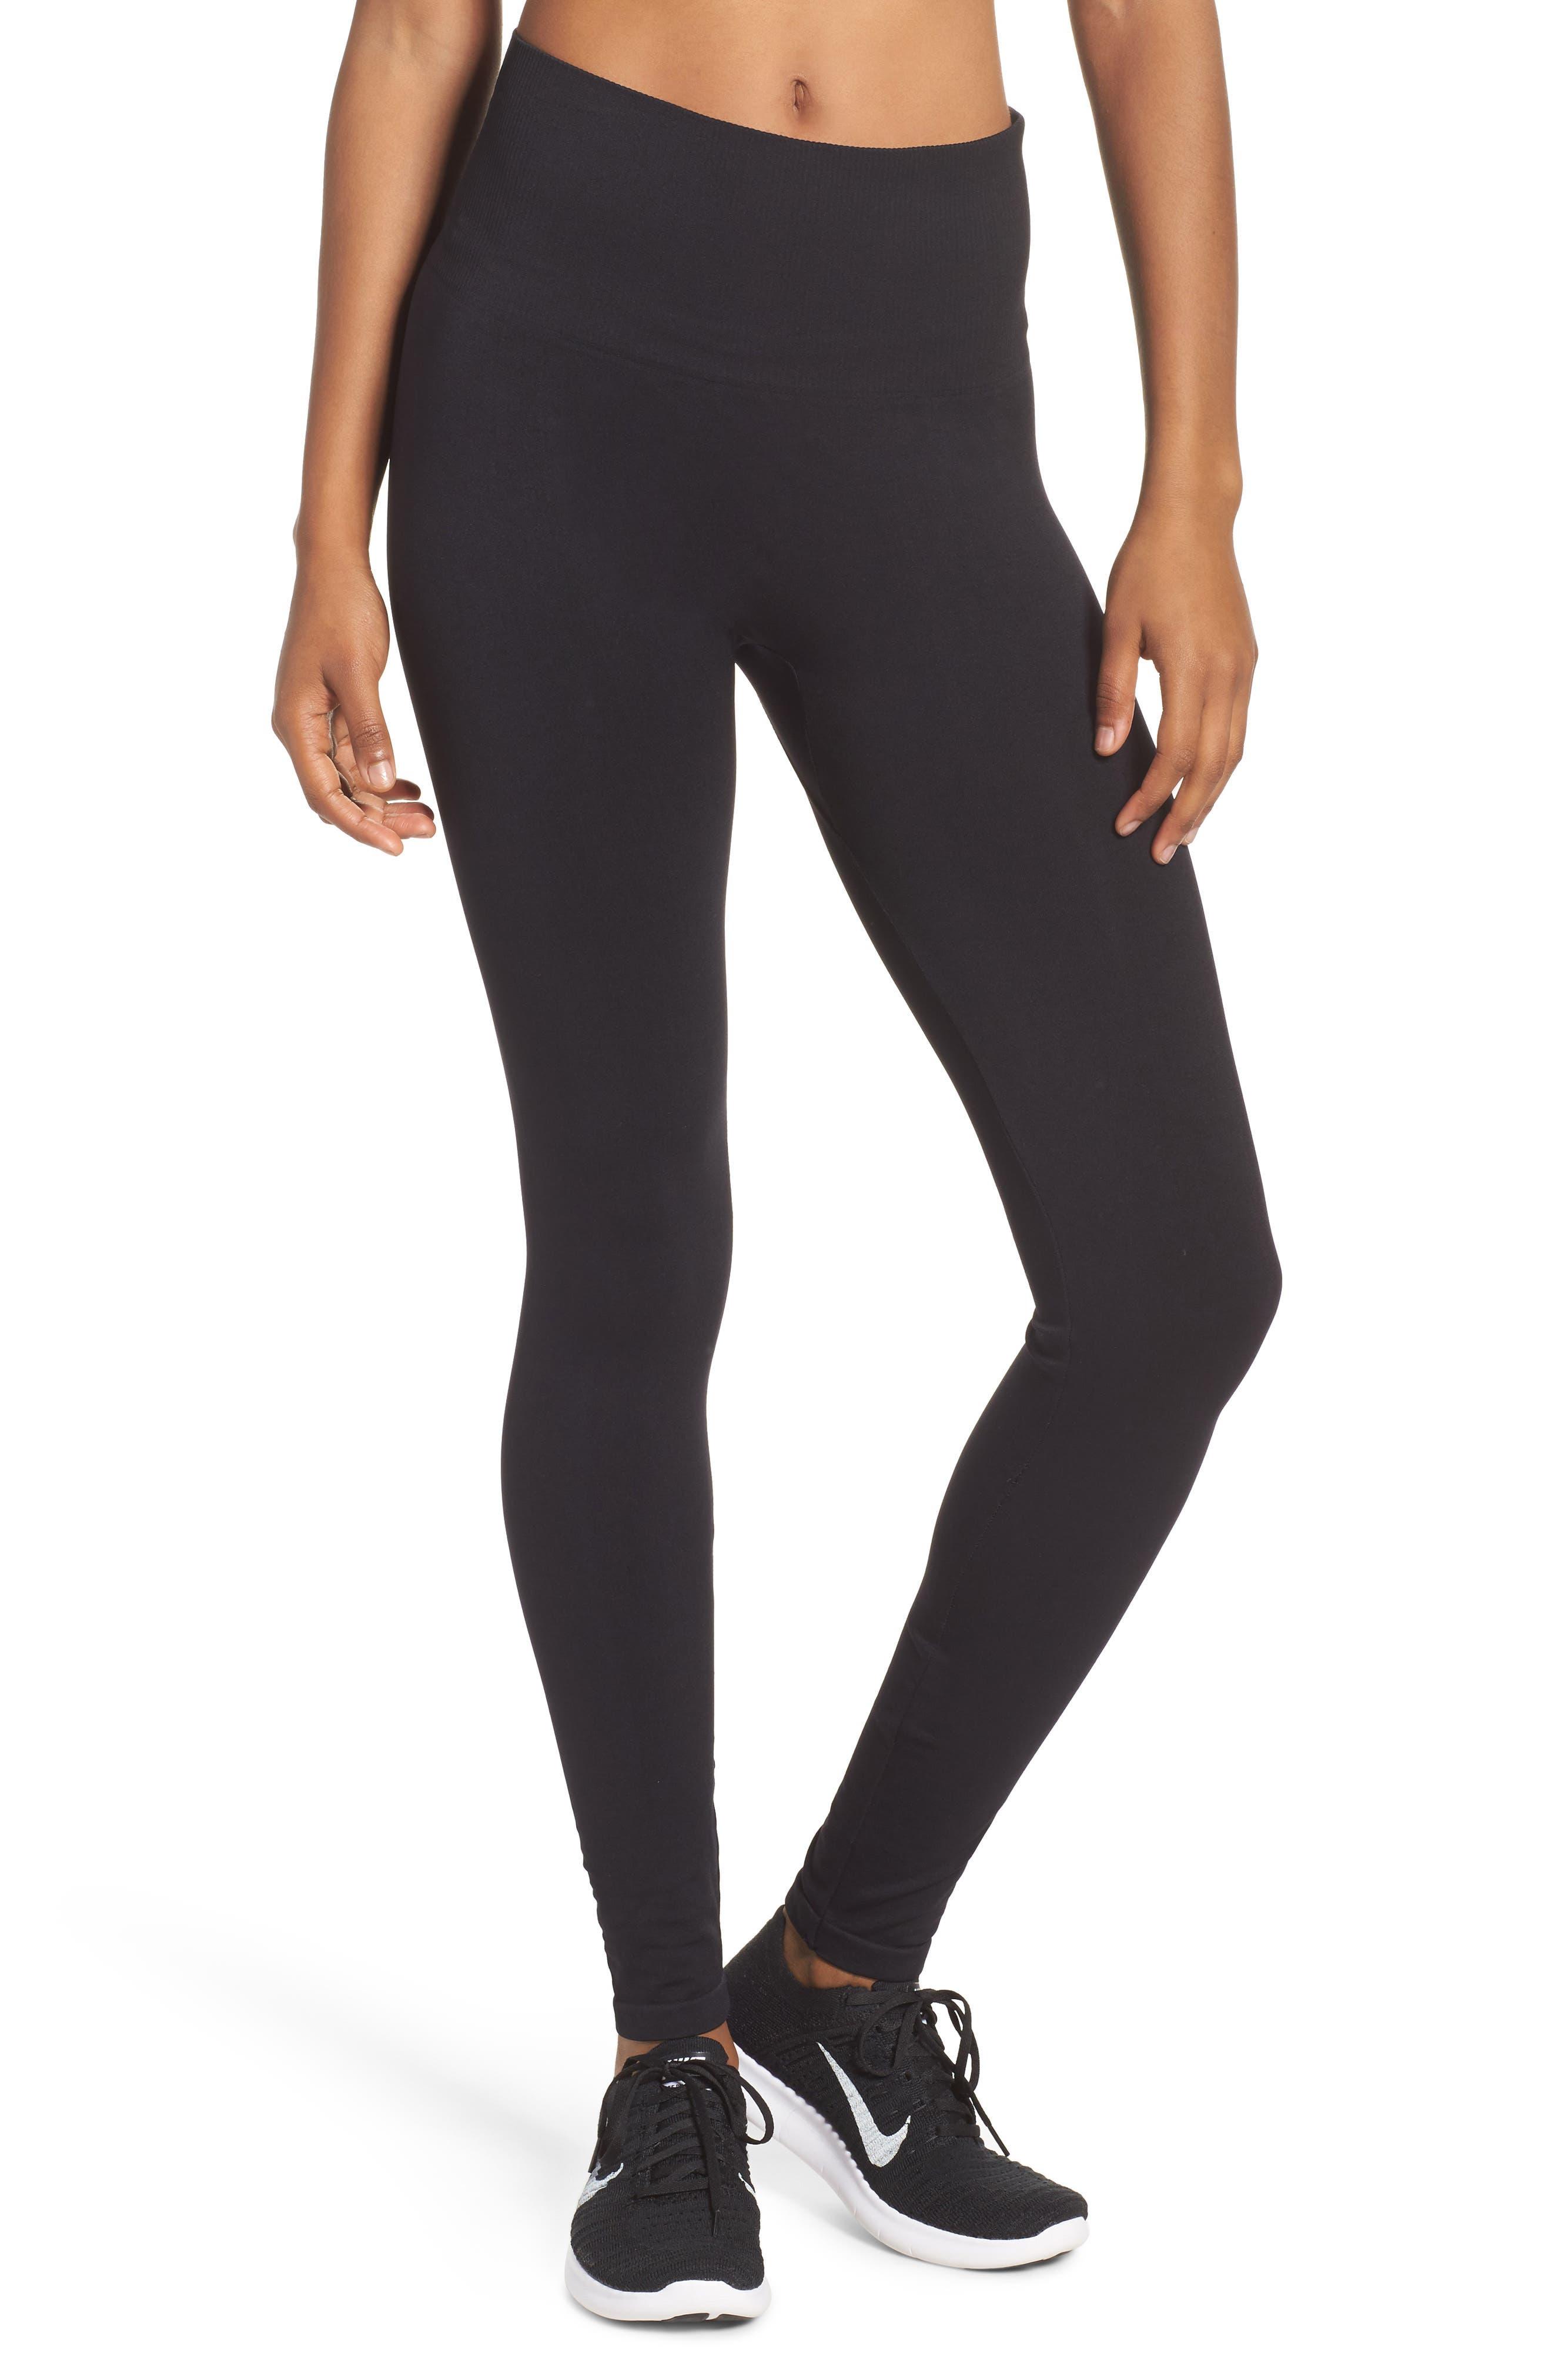 Main Image - Climawear Staple High Waist Leggings